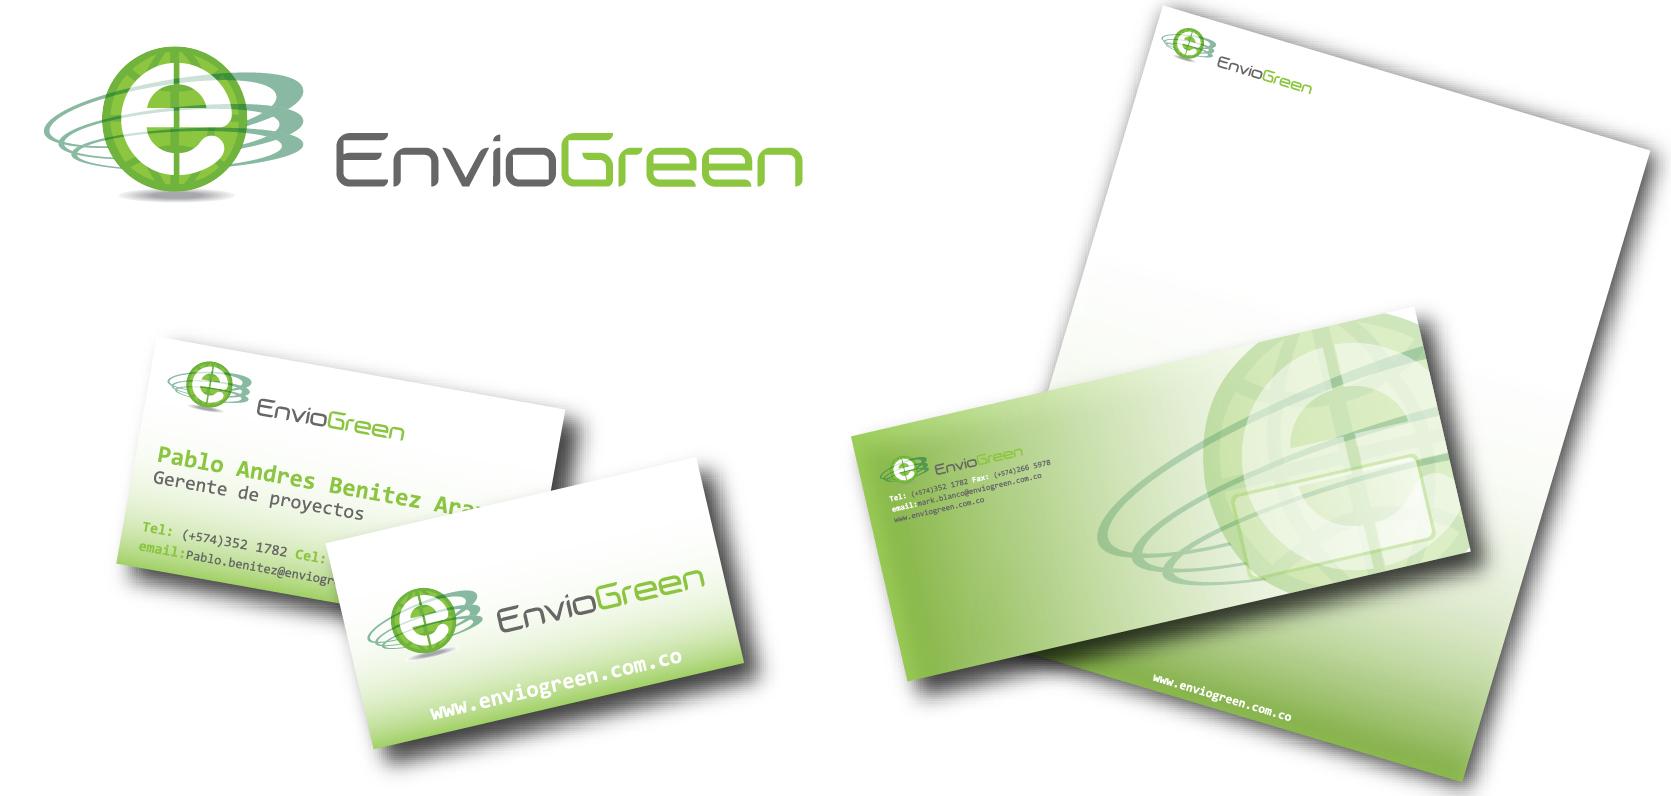 Enviogreen Branding